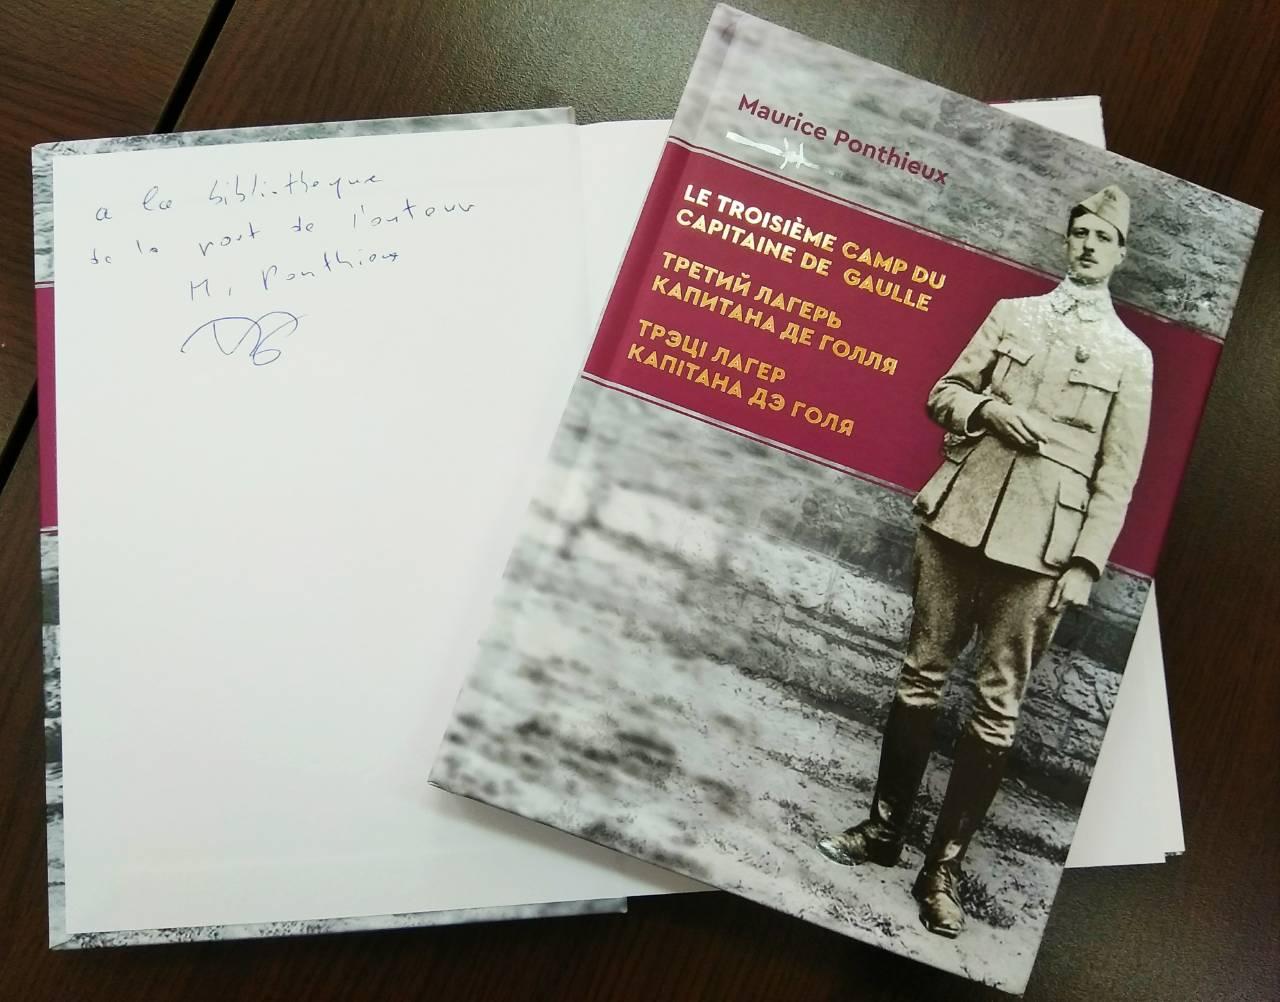 Презентация книги «Третий лагерь капитана де Голля»